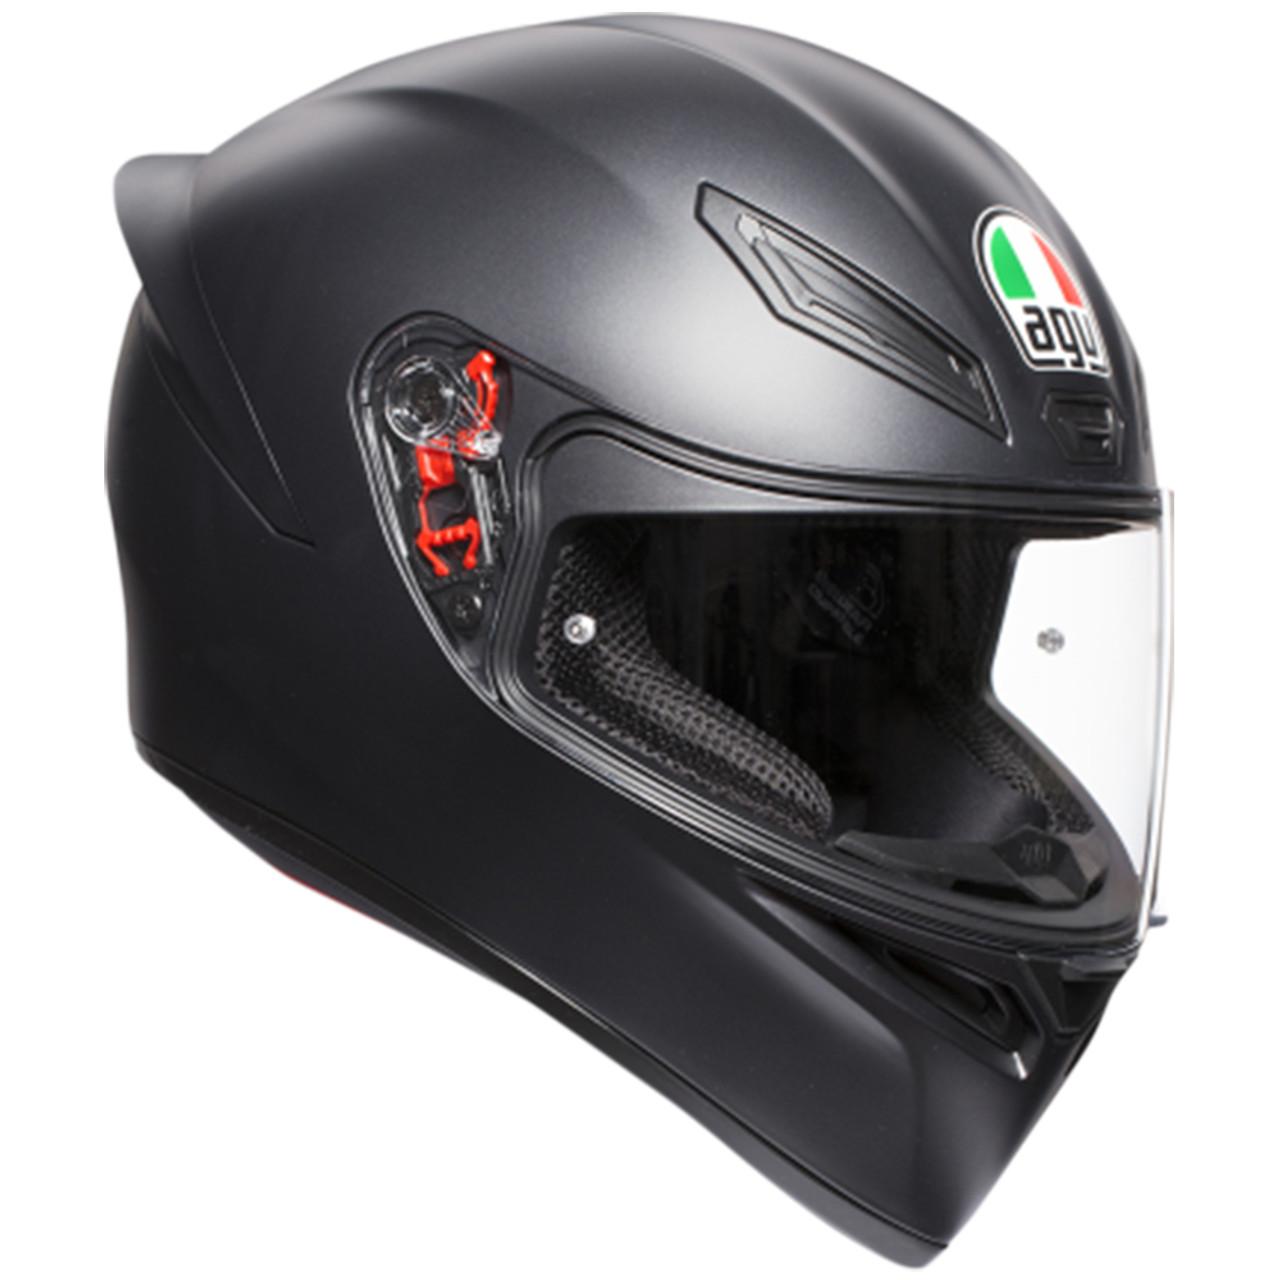 Agv K1 Solid Helmet Sportbike Track Gear